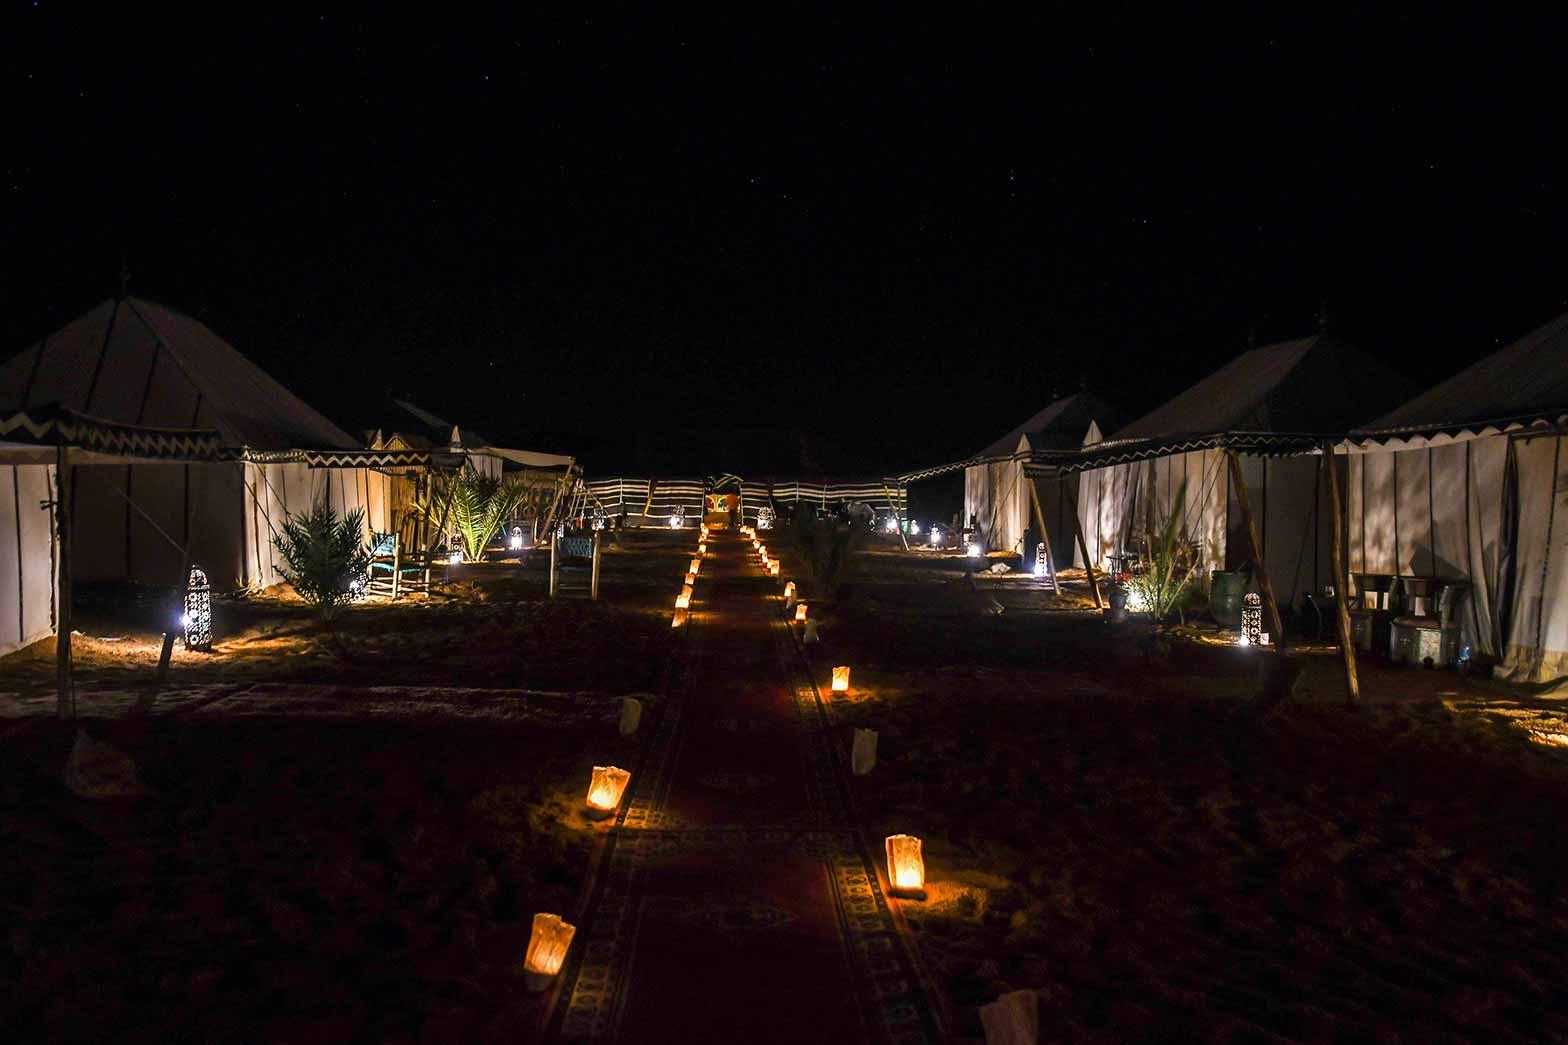 Luxury camping in the Sahara desert